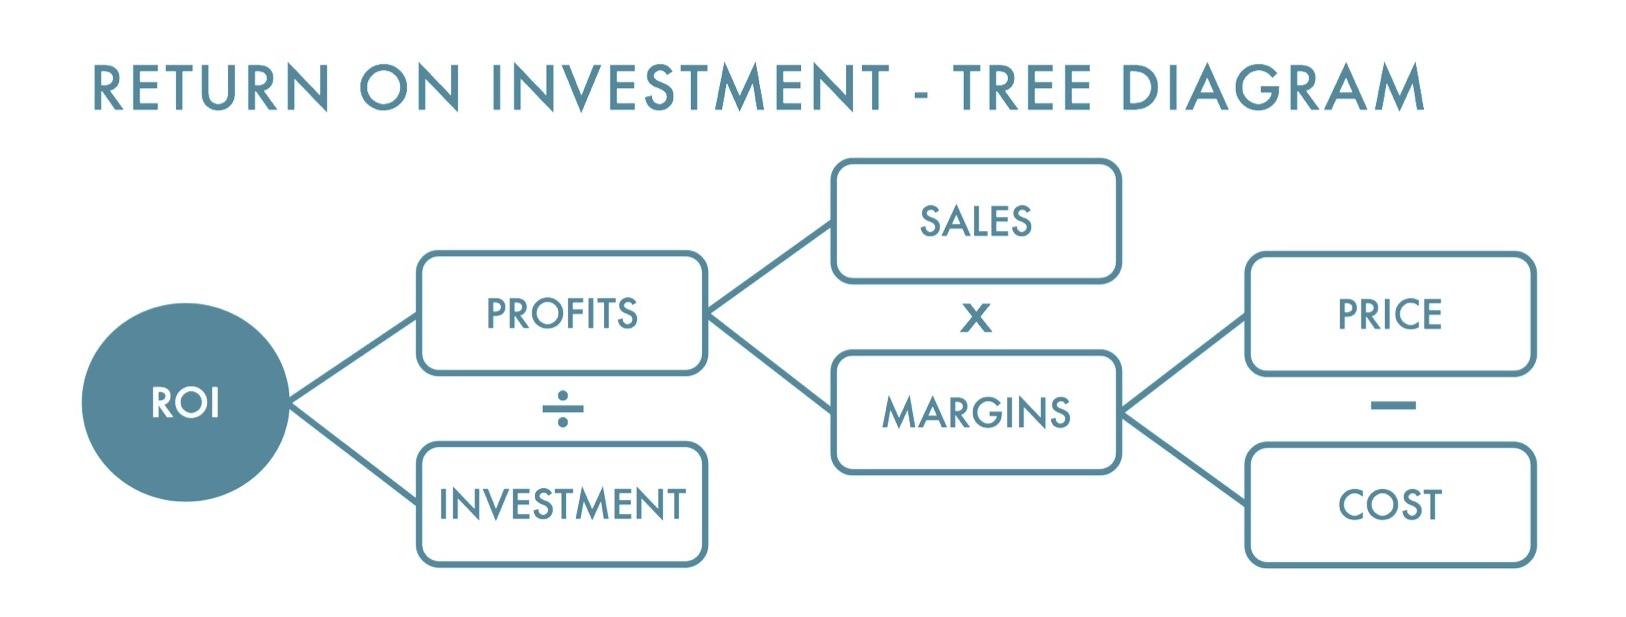 ROI_Tree_Diagram.jpg